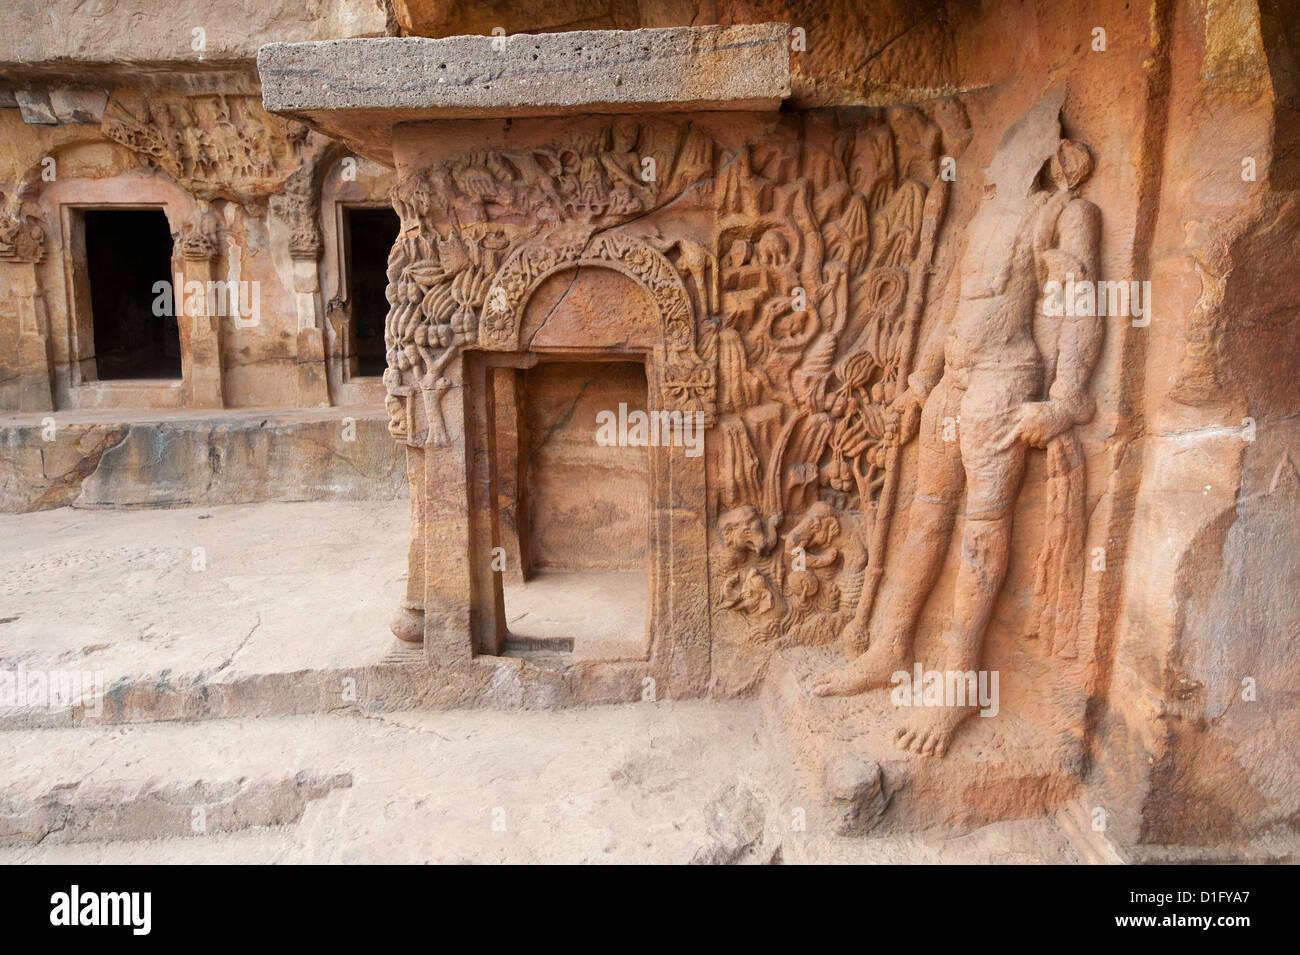 Ornate carving in Ranigumpha, cave number 1, Udayagiri caves, used as meeting place for Jain monks, Bhubaneshwar, - Stock Image